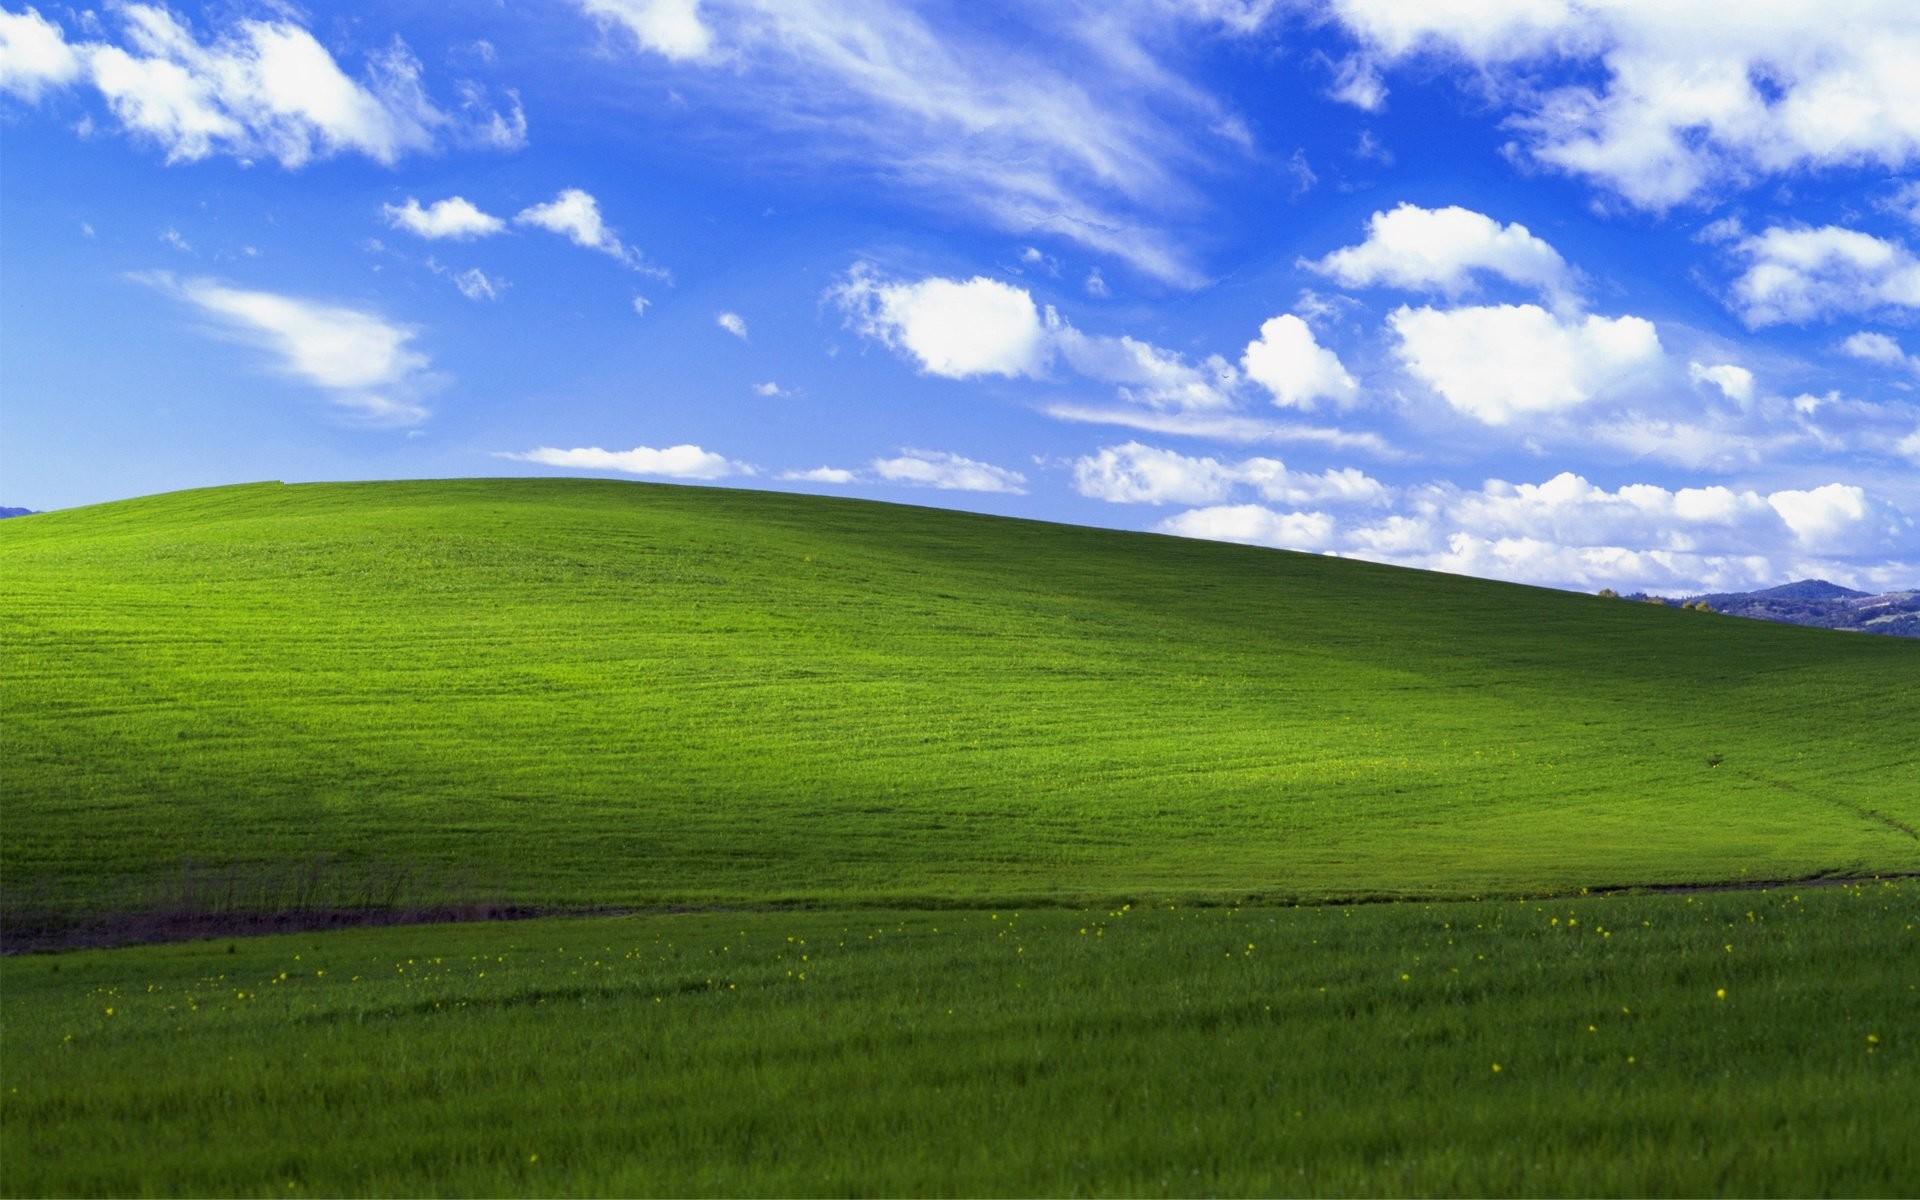 Windows Xp Bliss 423579